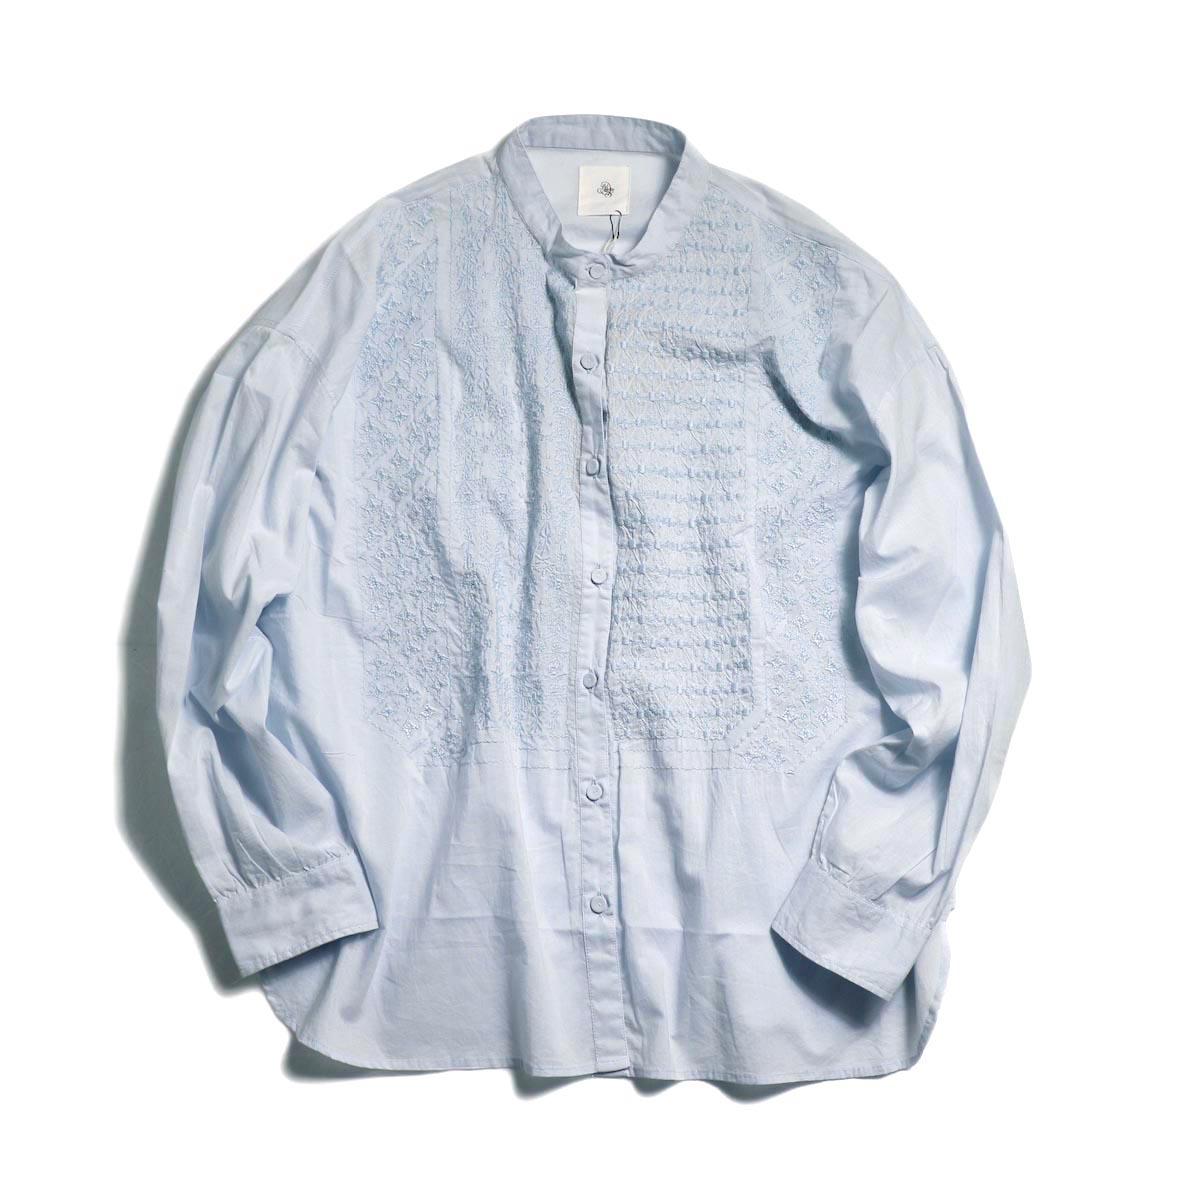 maison de soil / Banded Collar Emb Shirt -Sax Blue